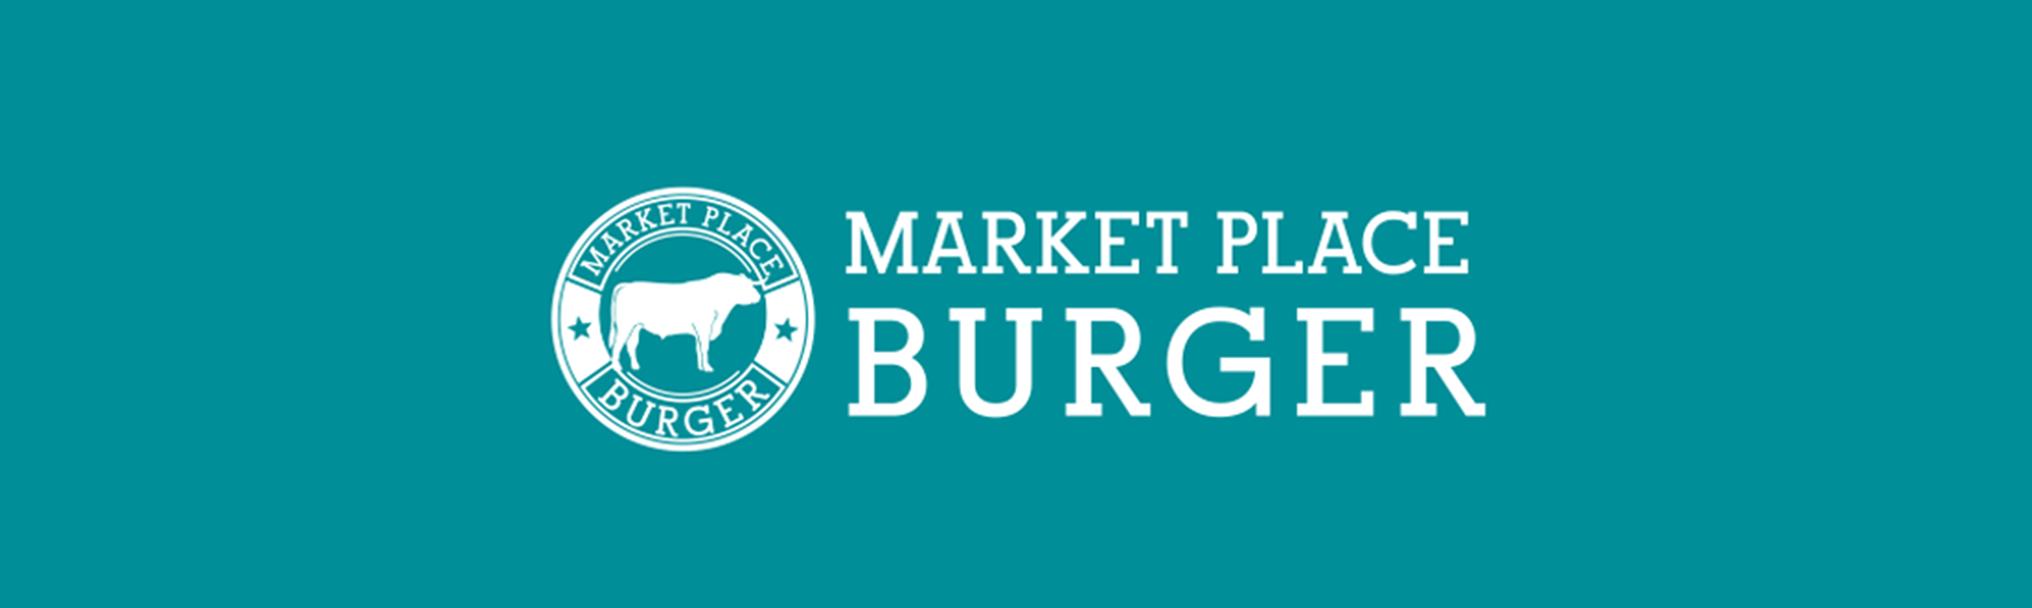 marketplace burger.png